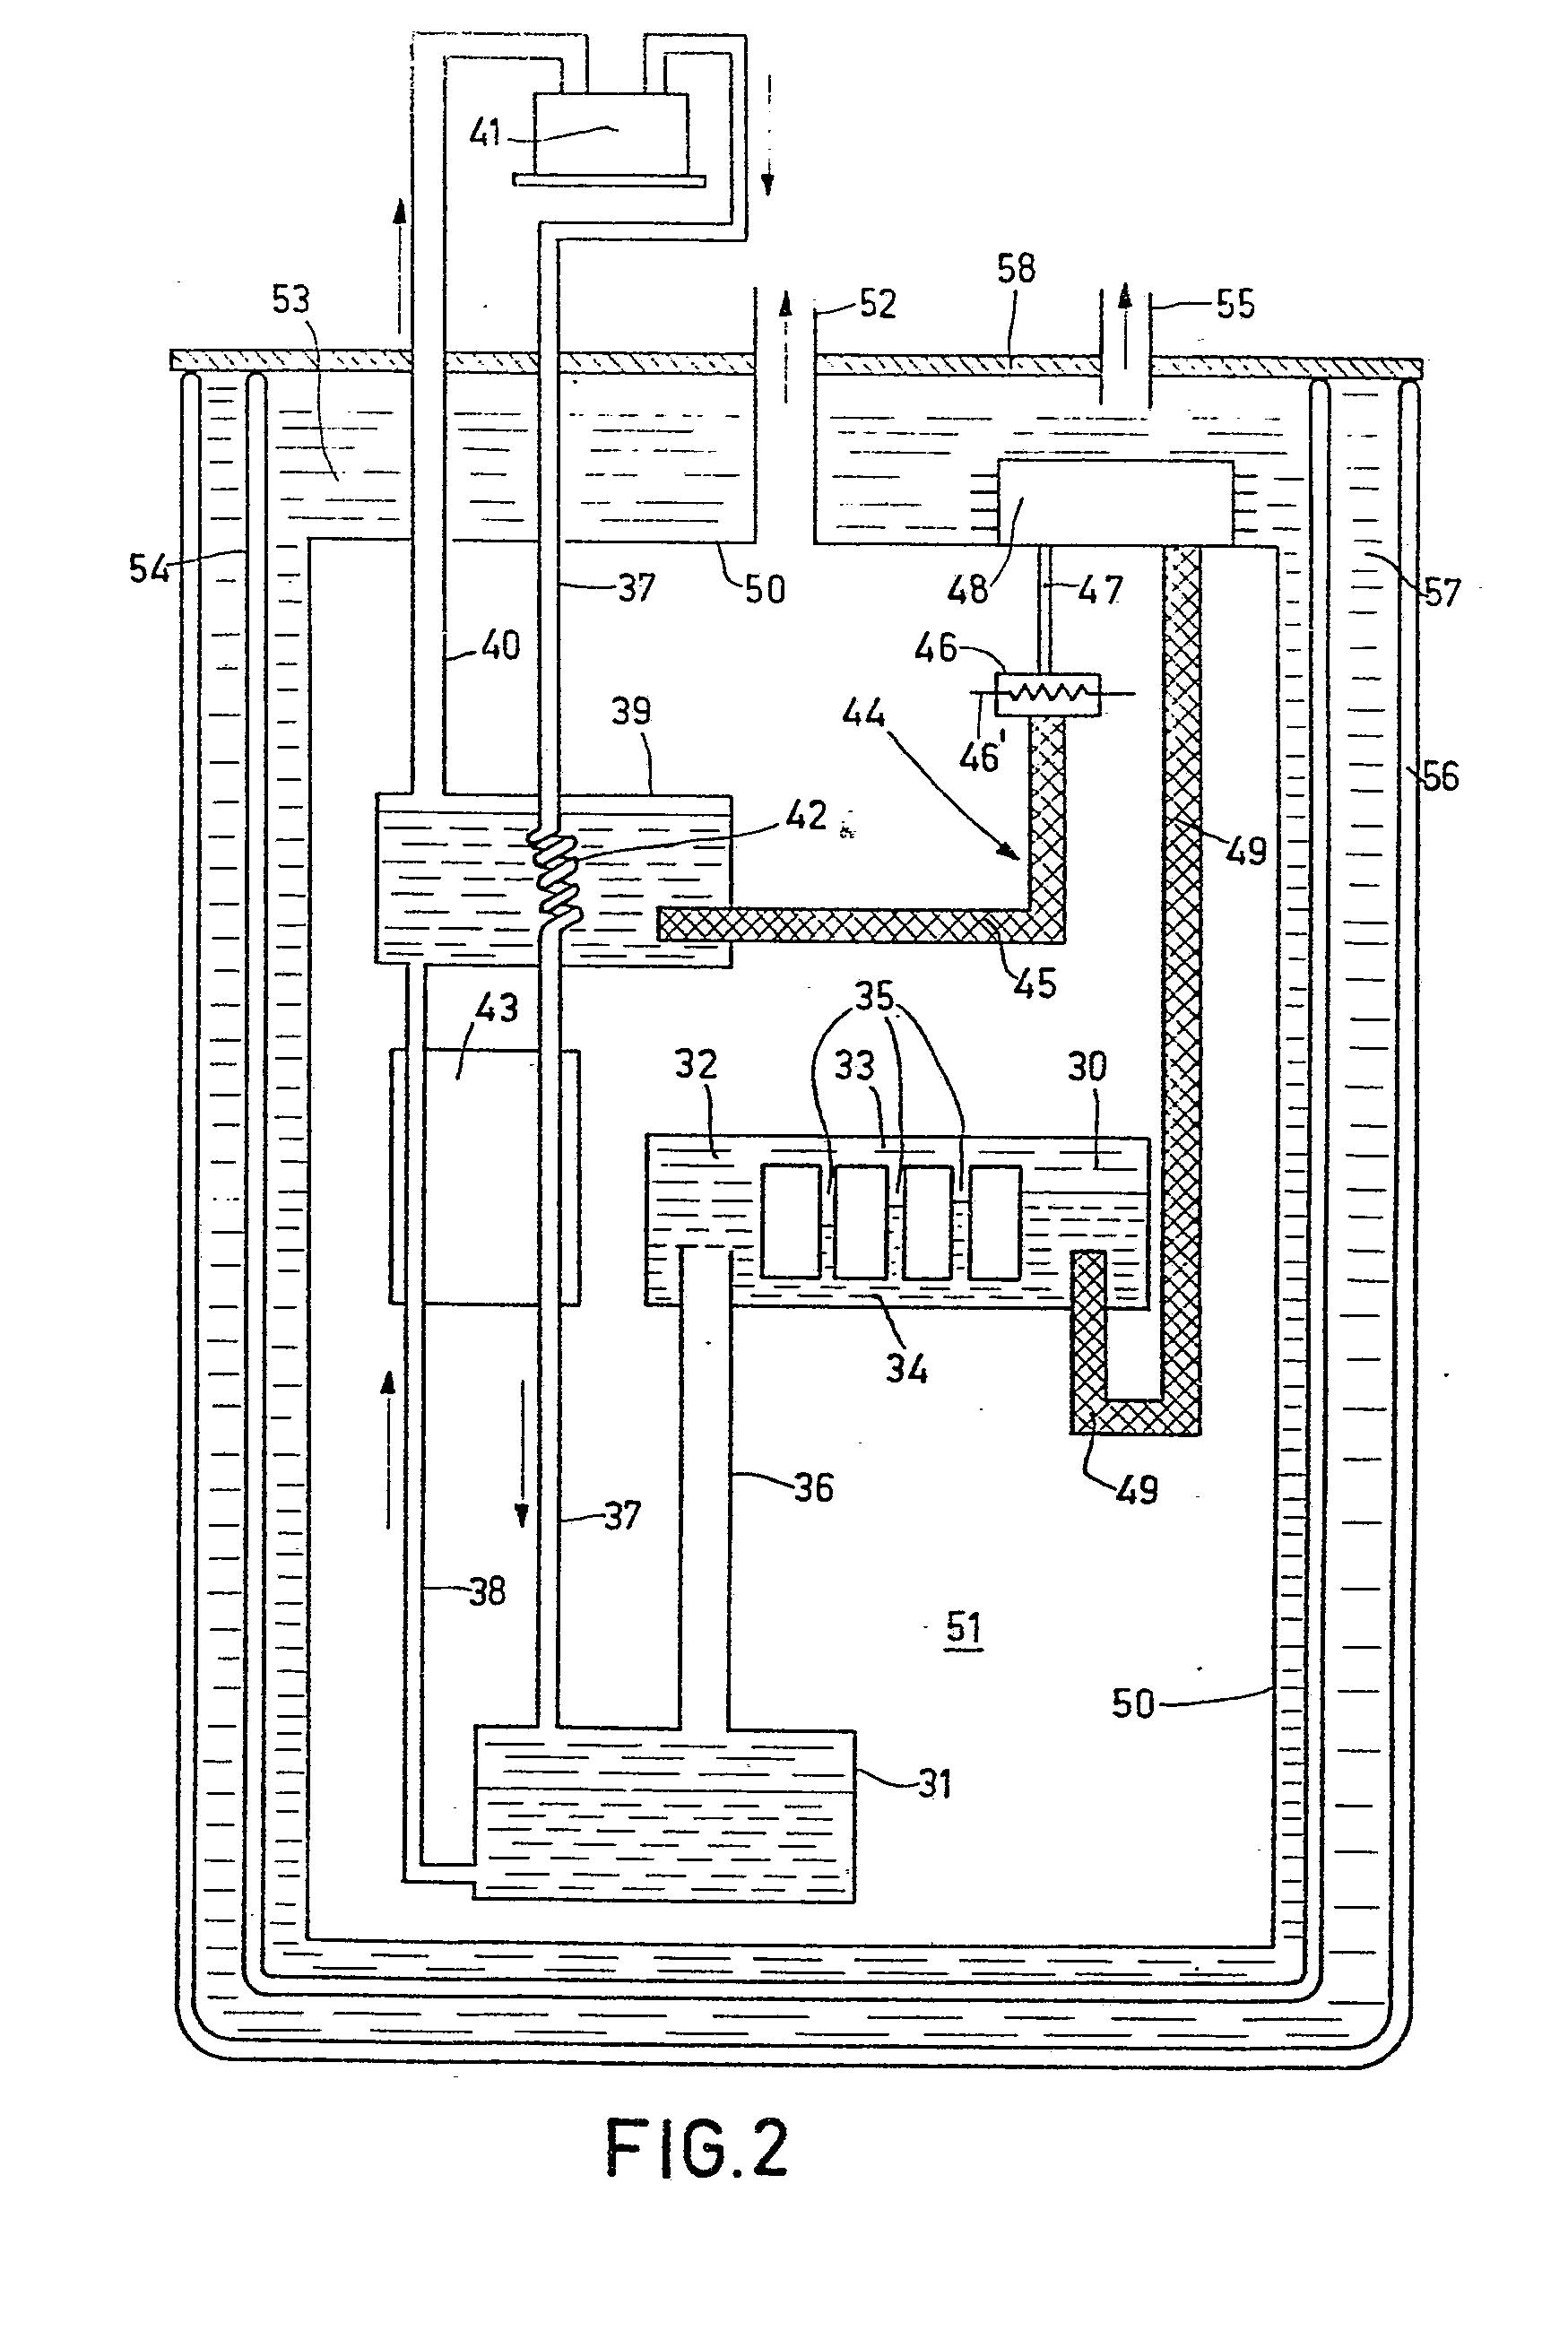 The Reston Groundwater Dating Laboratory